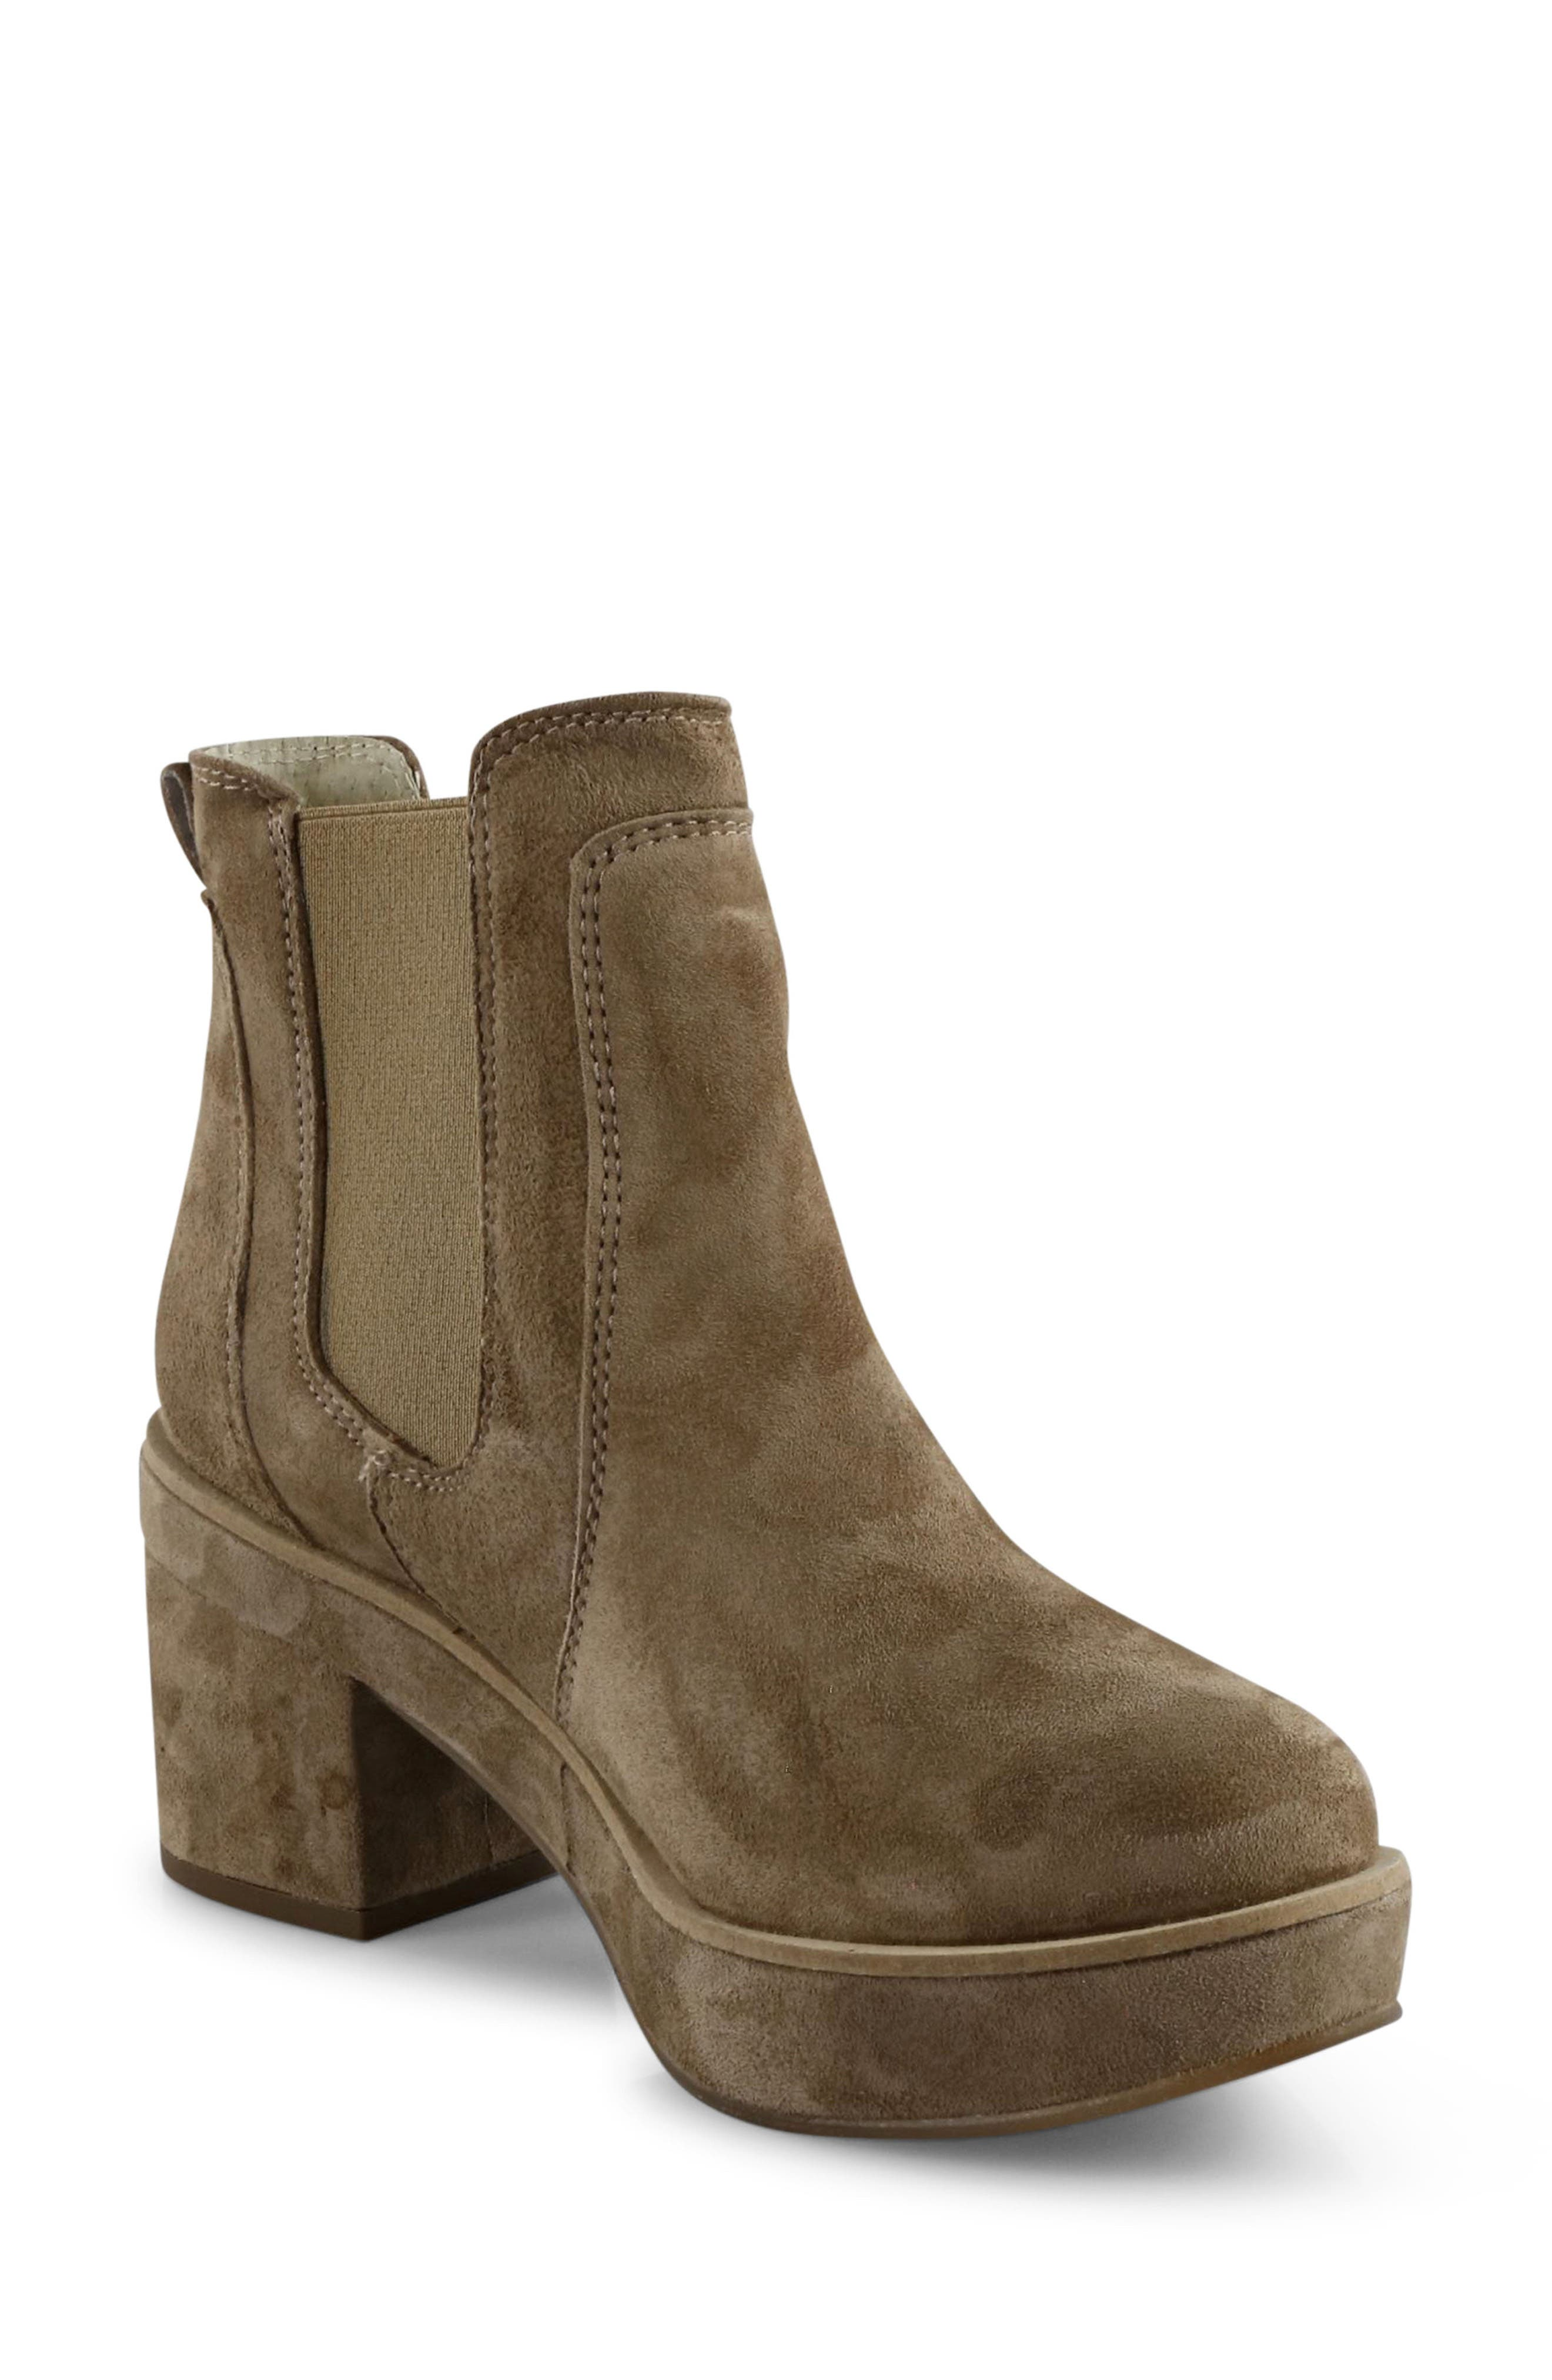 Darli Platform Chelsea Boot,                         Main,                         color, Caramel Suede